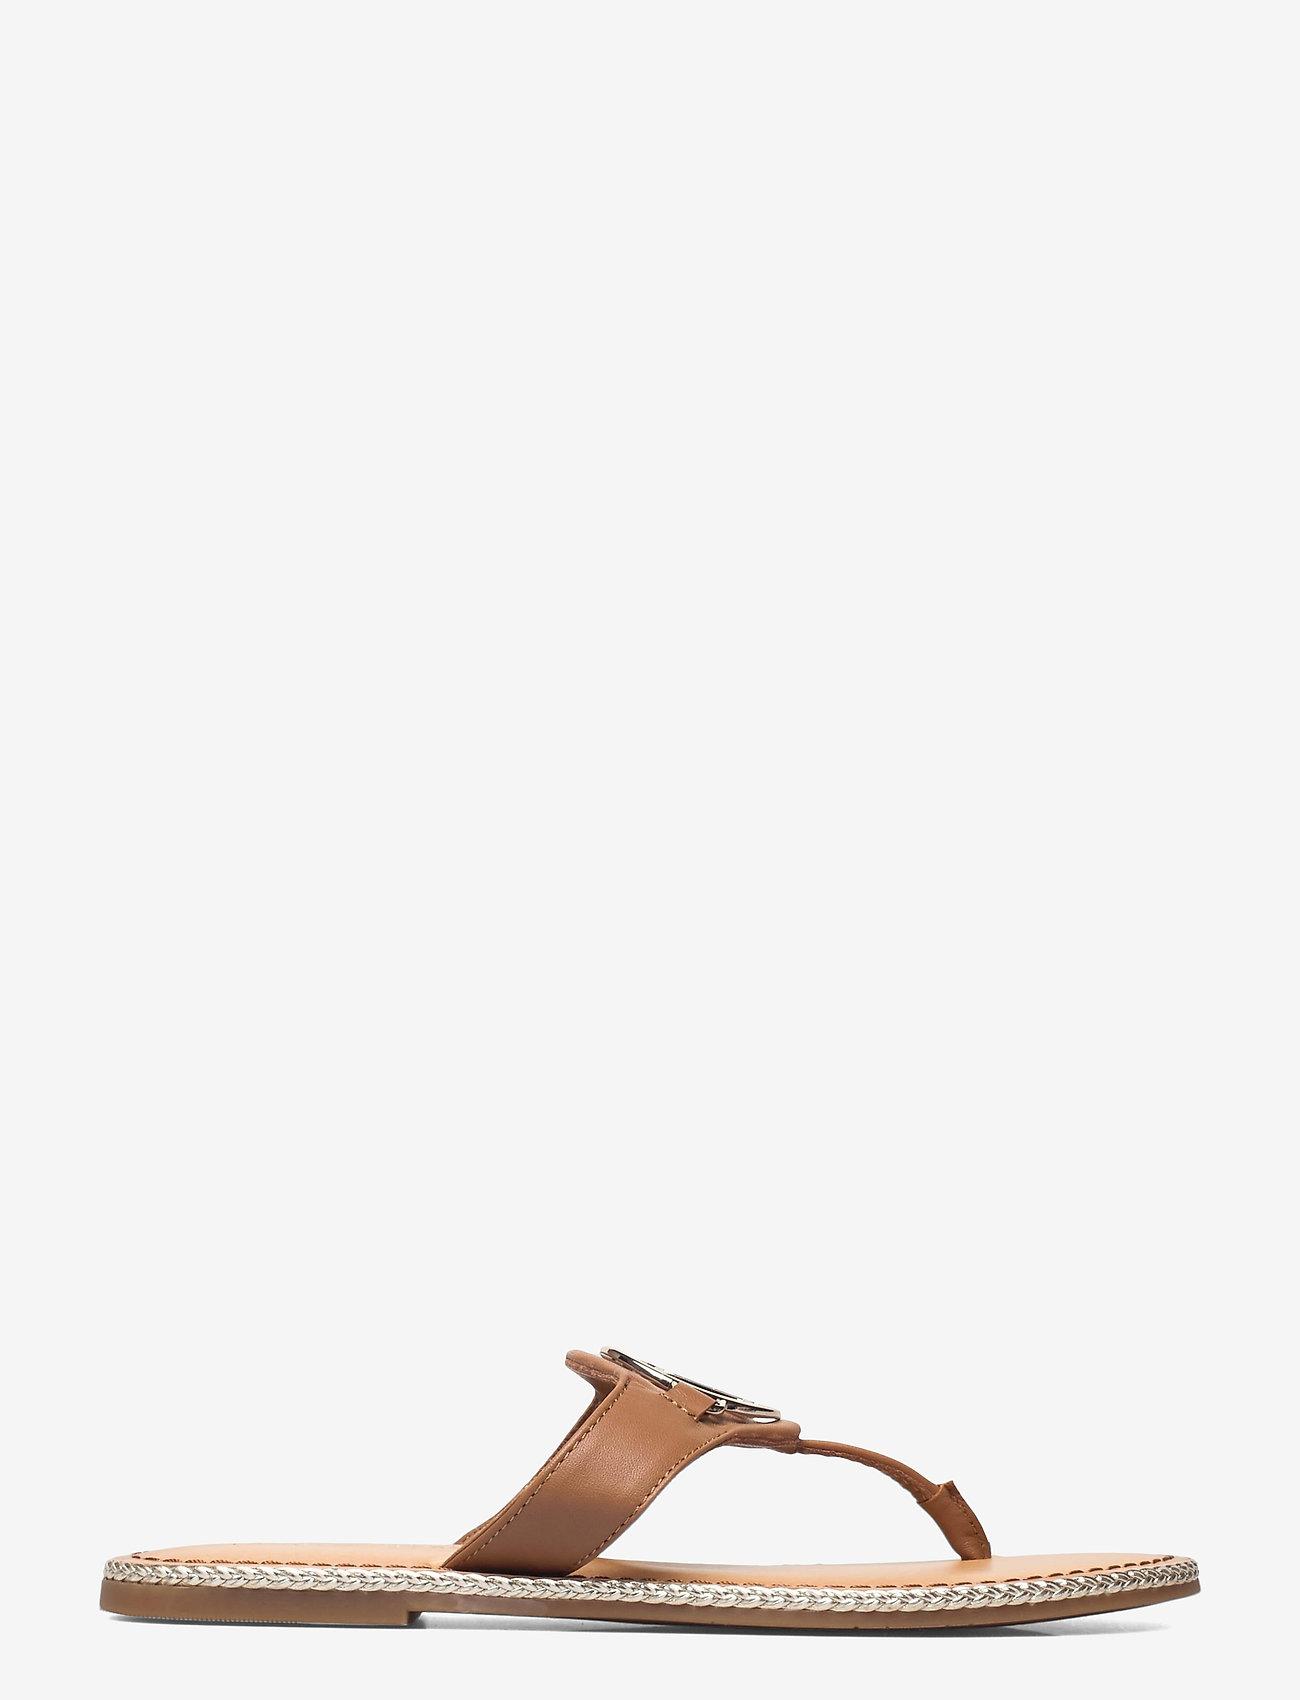 Tommy Hilfiger - ESSENTIAL LEATHER FLAT SANDAL - flat sandals - summer cognac - 1